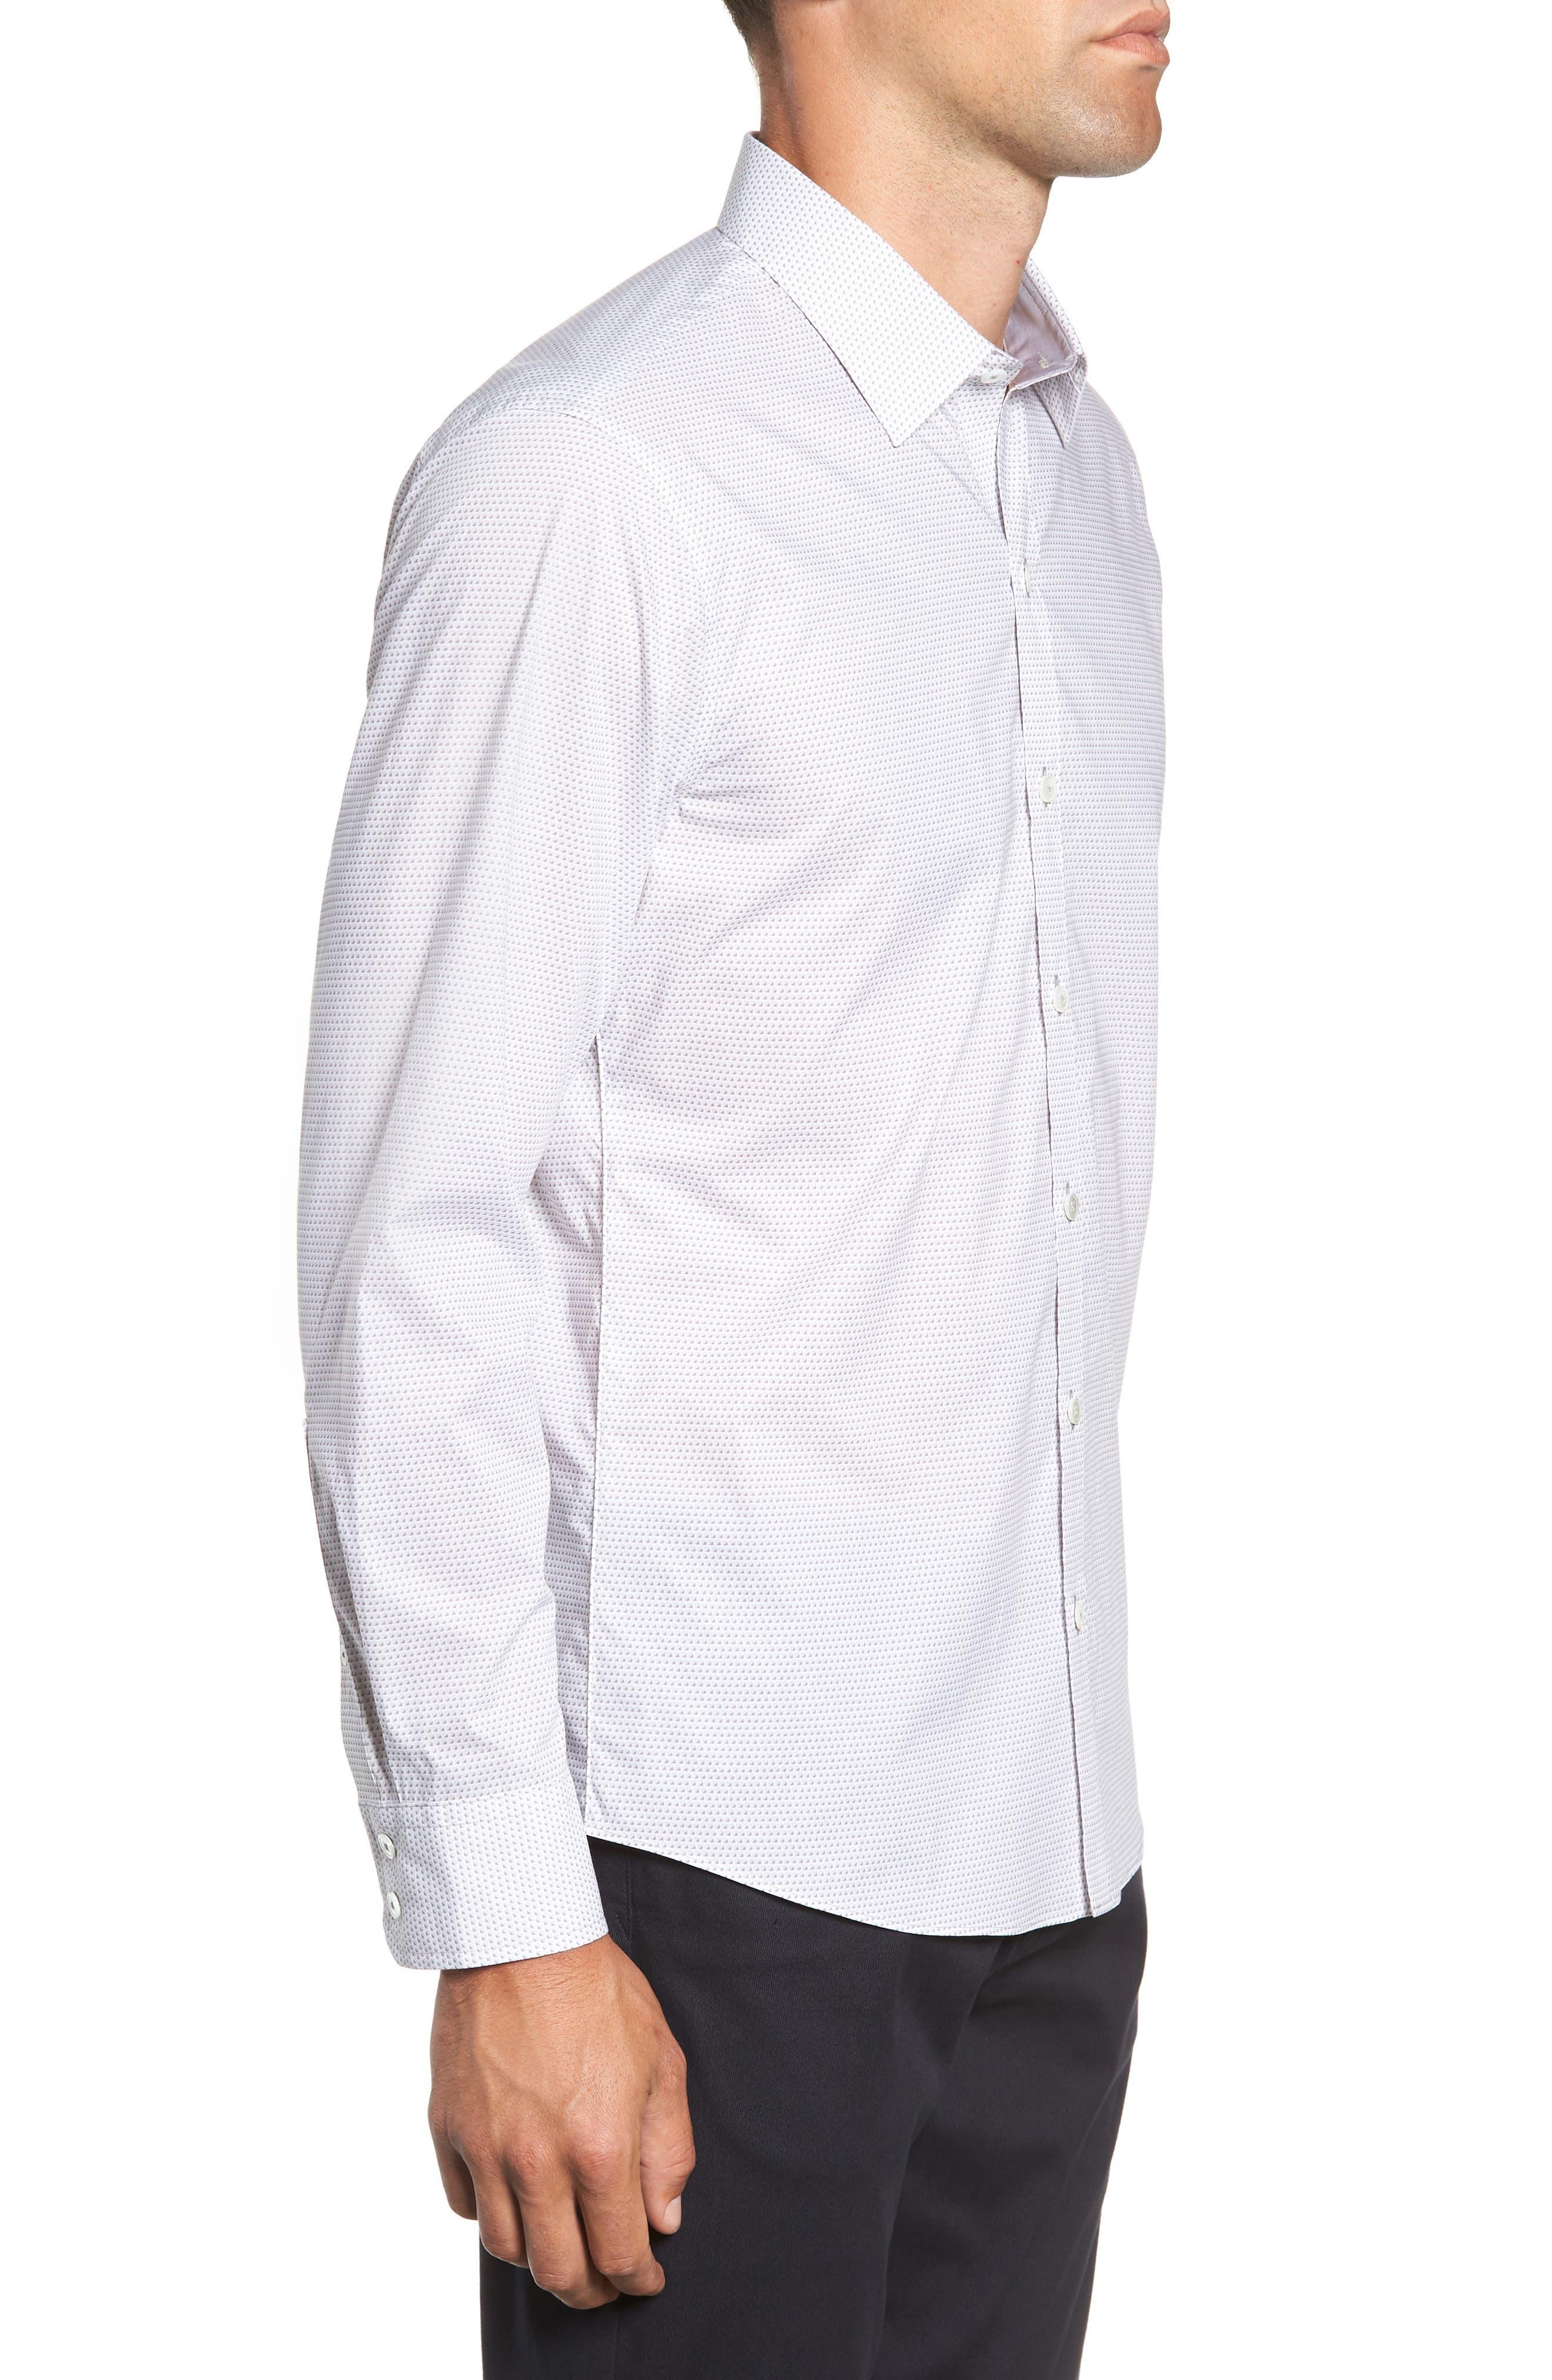 Toledo Regular Fit Microdot Sport Shirt,                             Alternate thumbnail 4, color,                             100